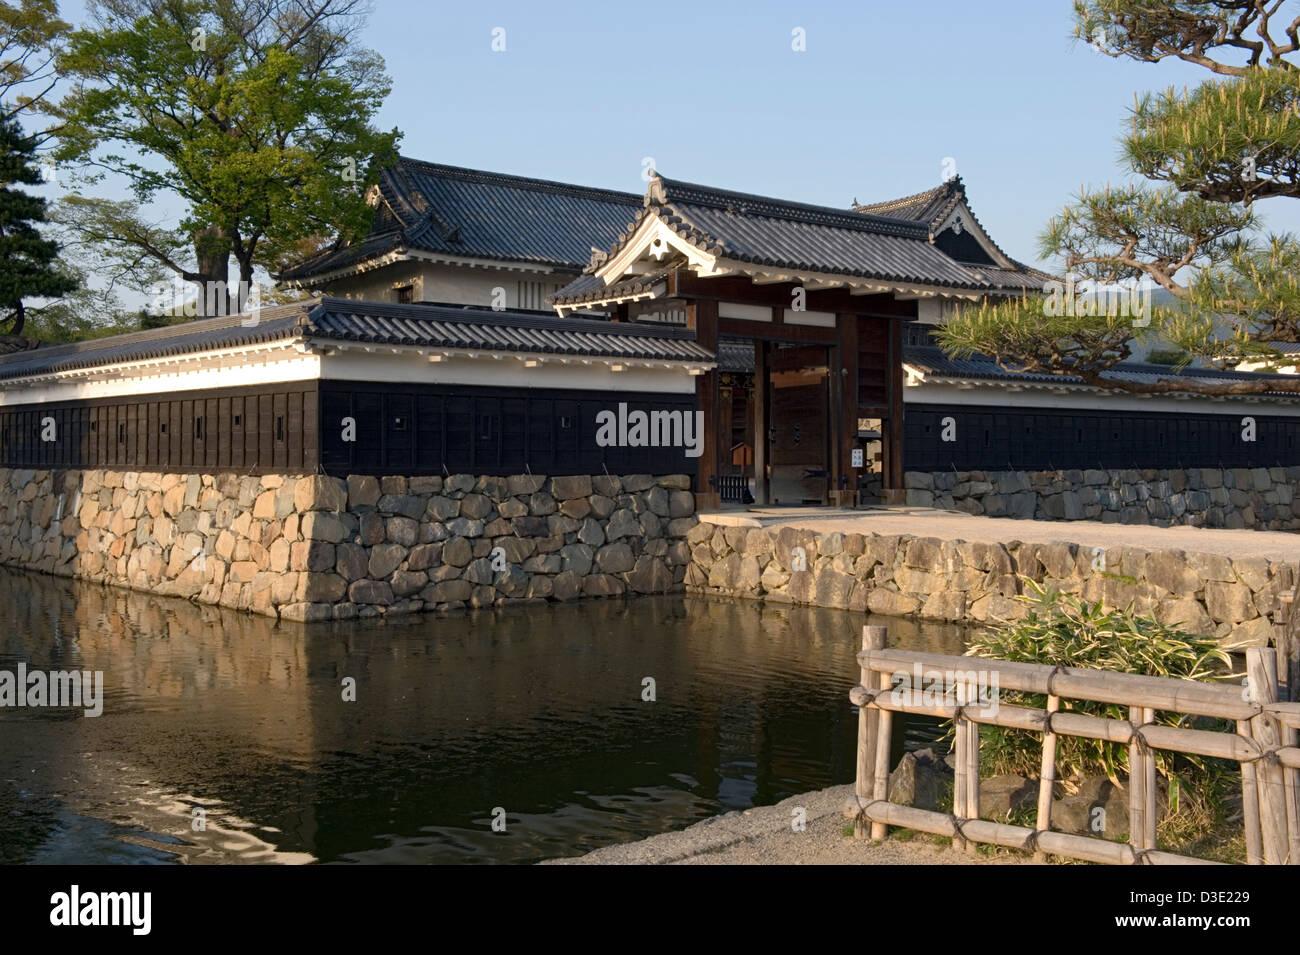 Kuromon, Black Gate, at Matsumoto Castle, also Crow Castle, a National Treasure of Japan built by Shimadachi Sadanaga. - Stock Image